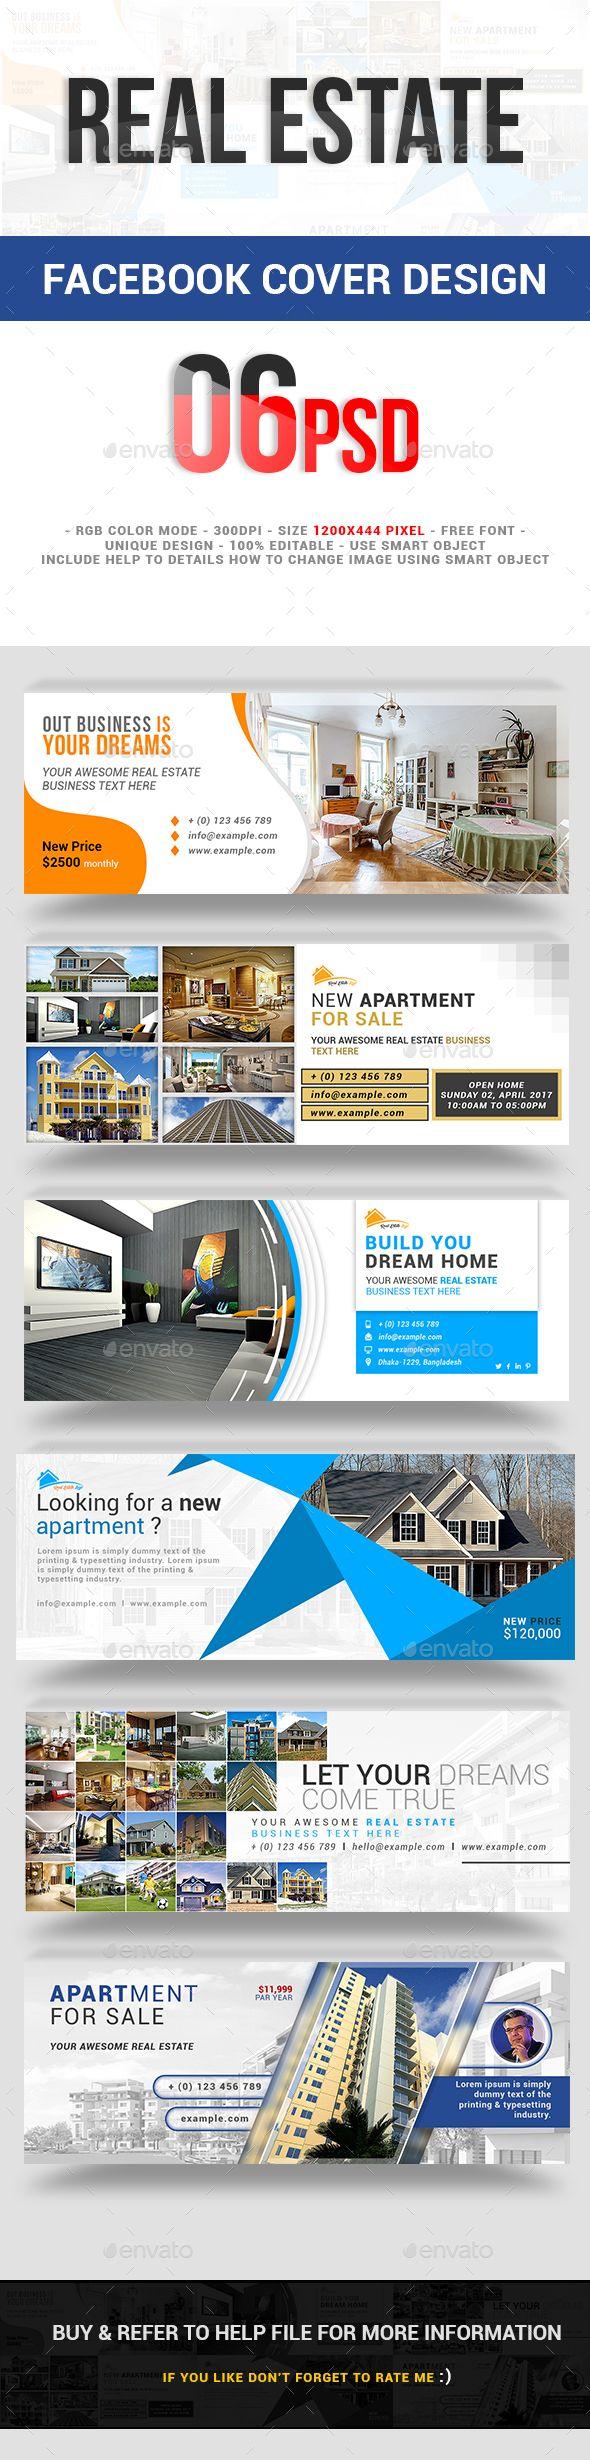 Real Estate Facebook Cover Design Templates Psd Facebook Timeline